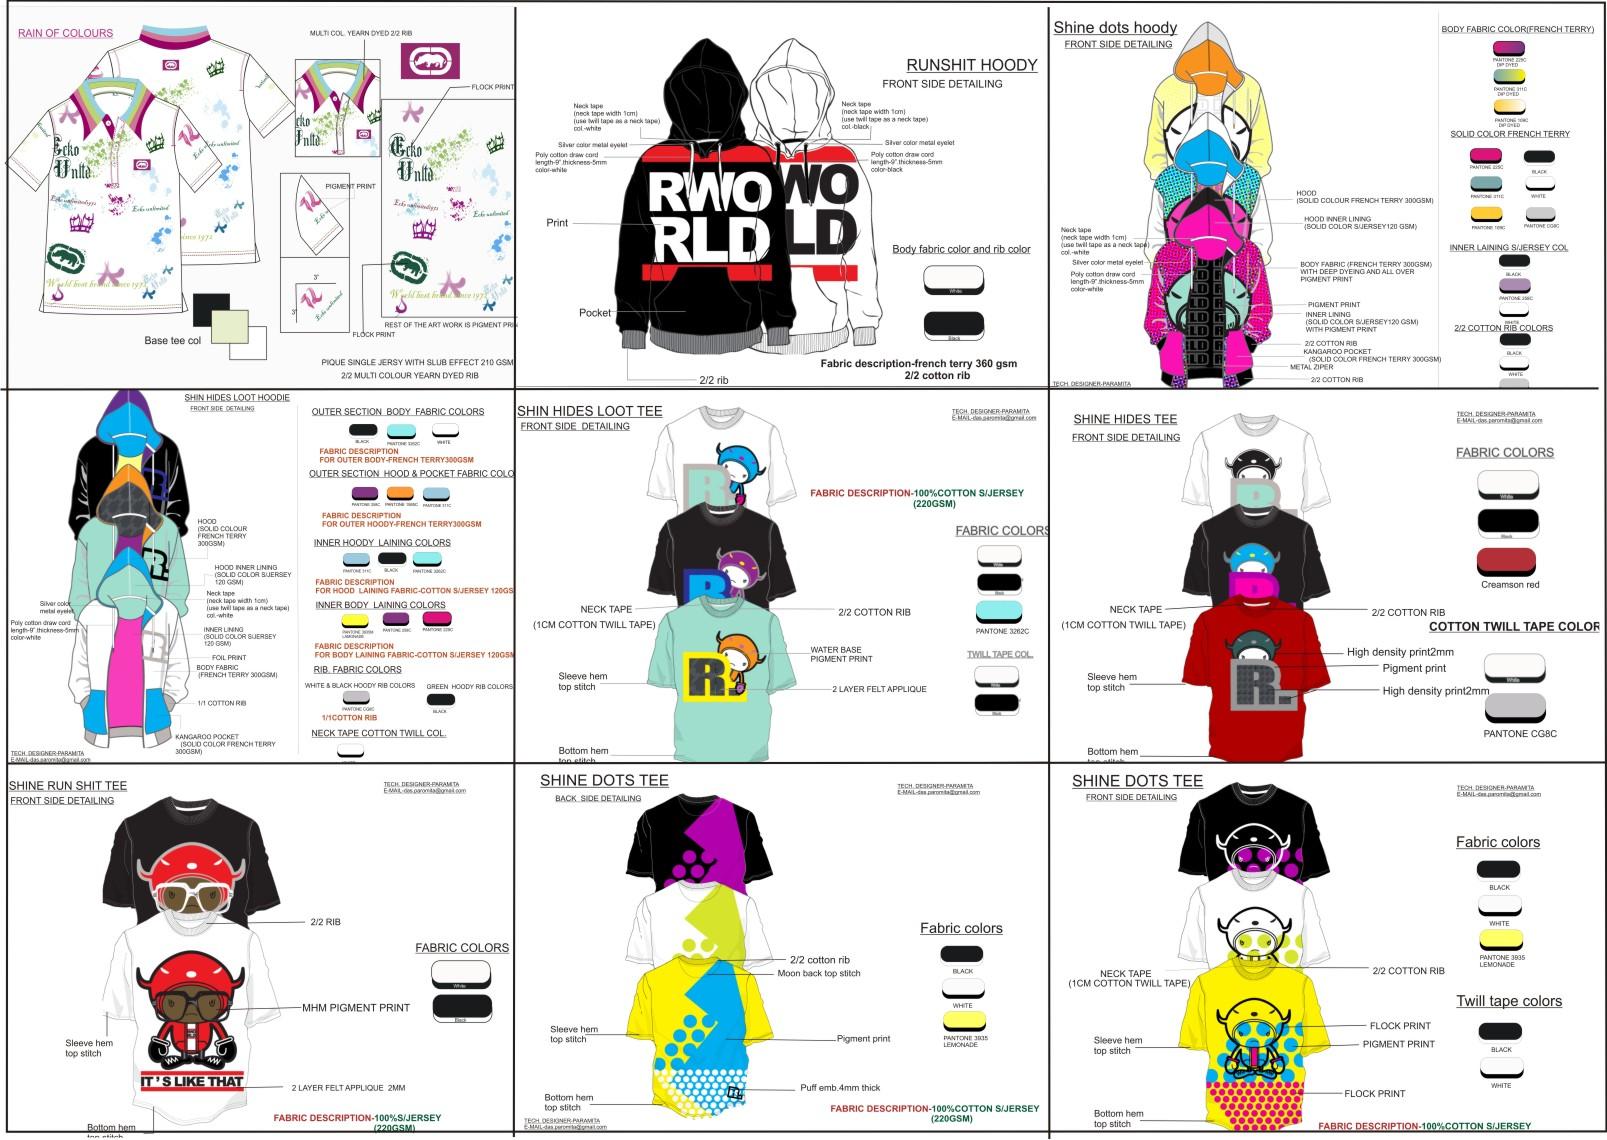 Tech Pack Design By Paromita Das Clothing Designer At